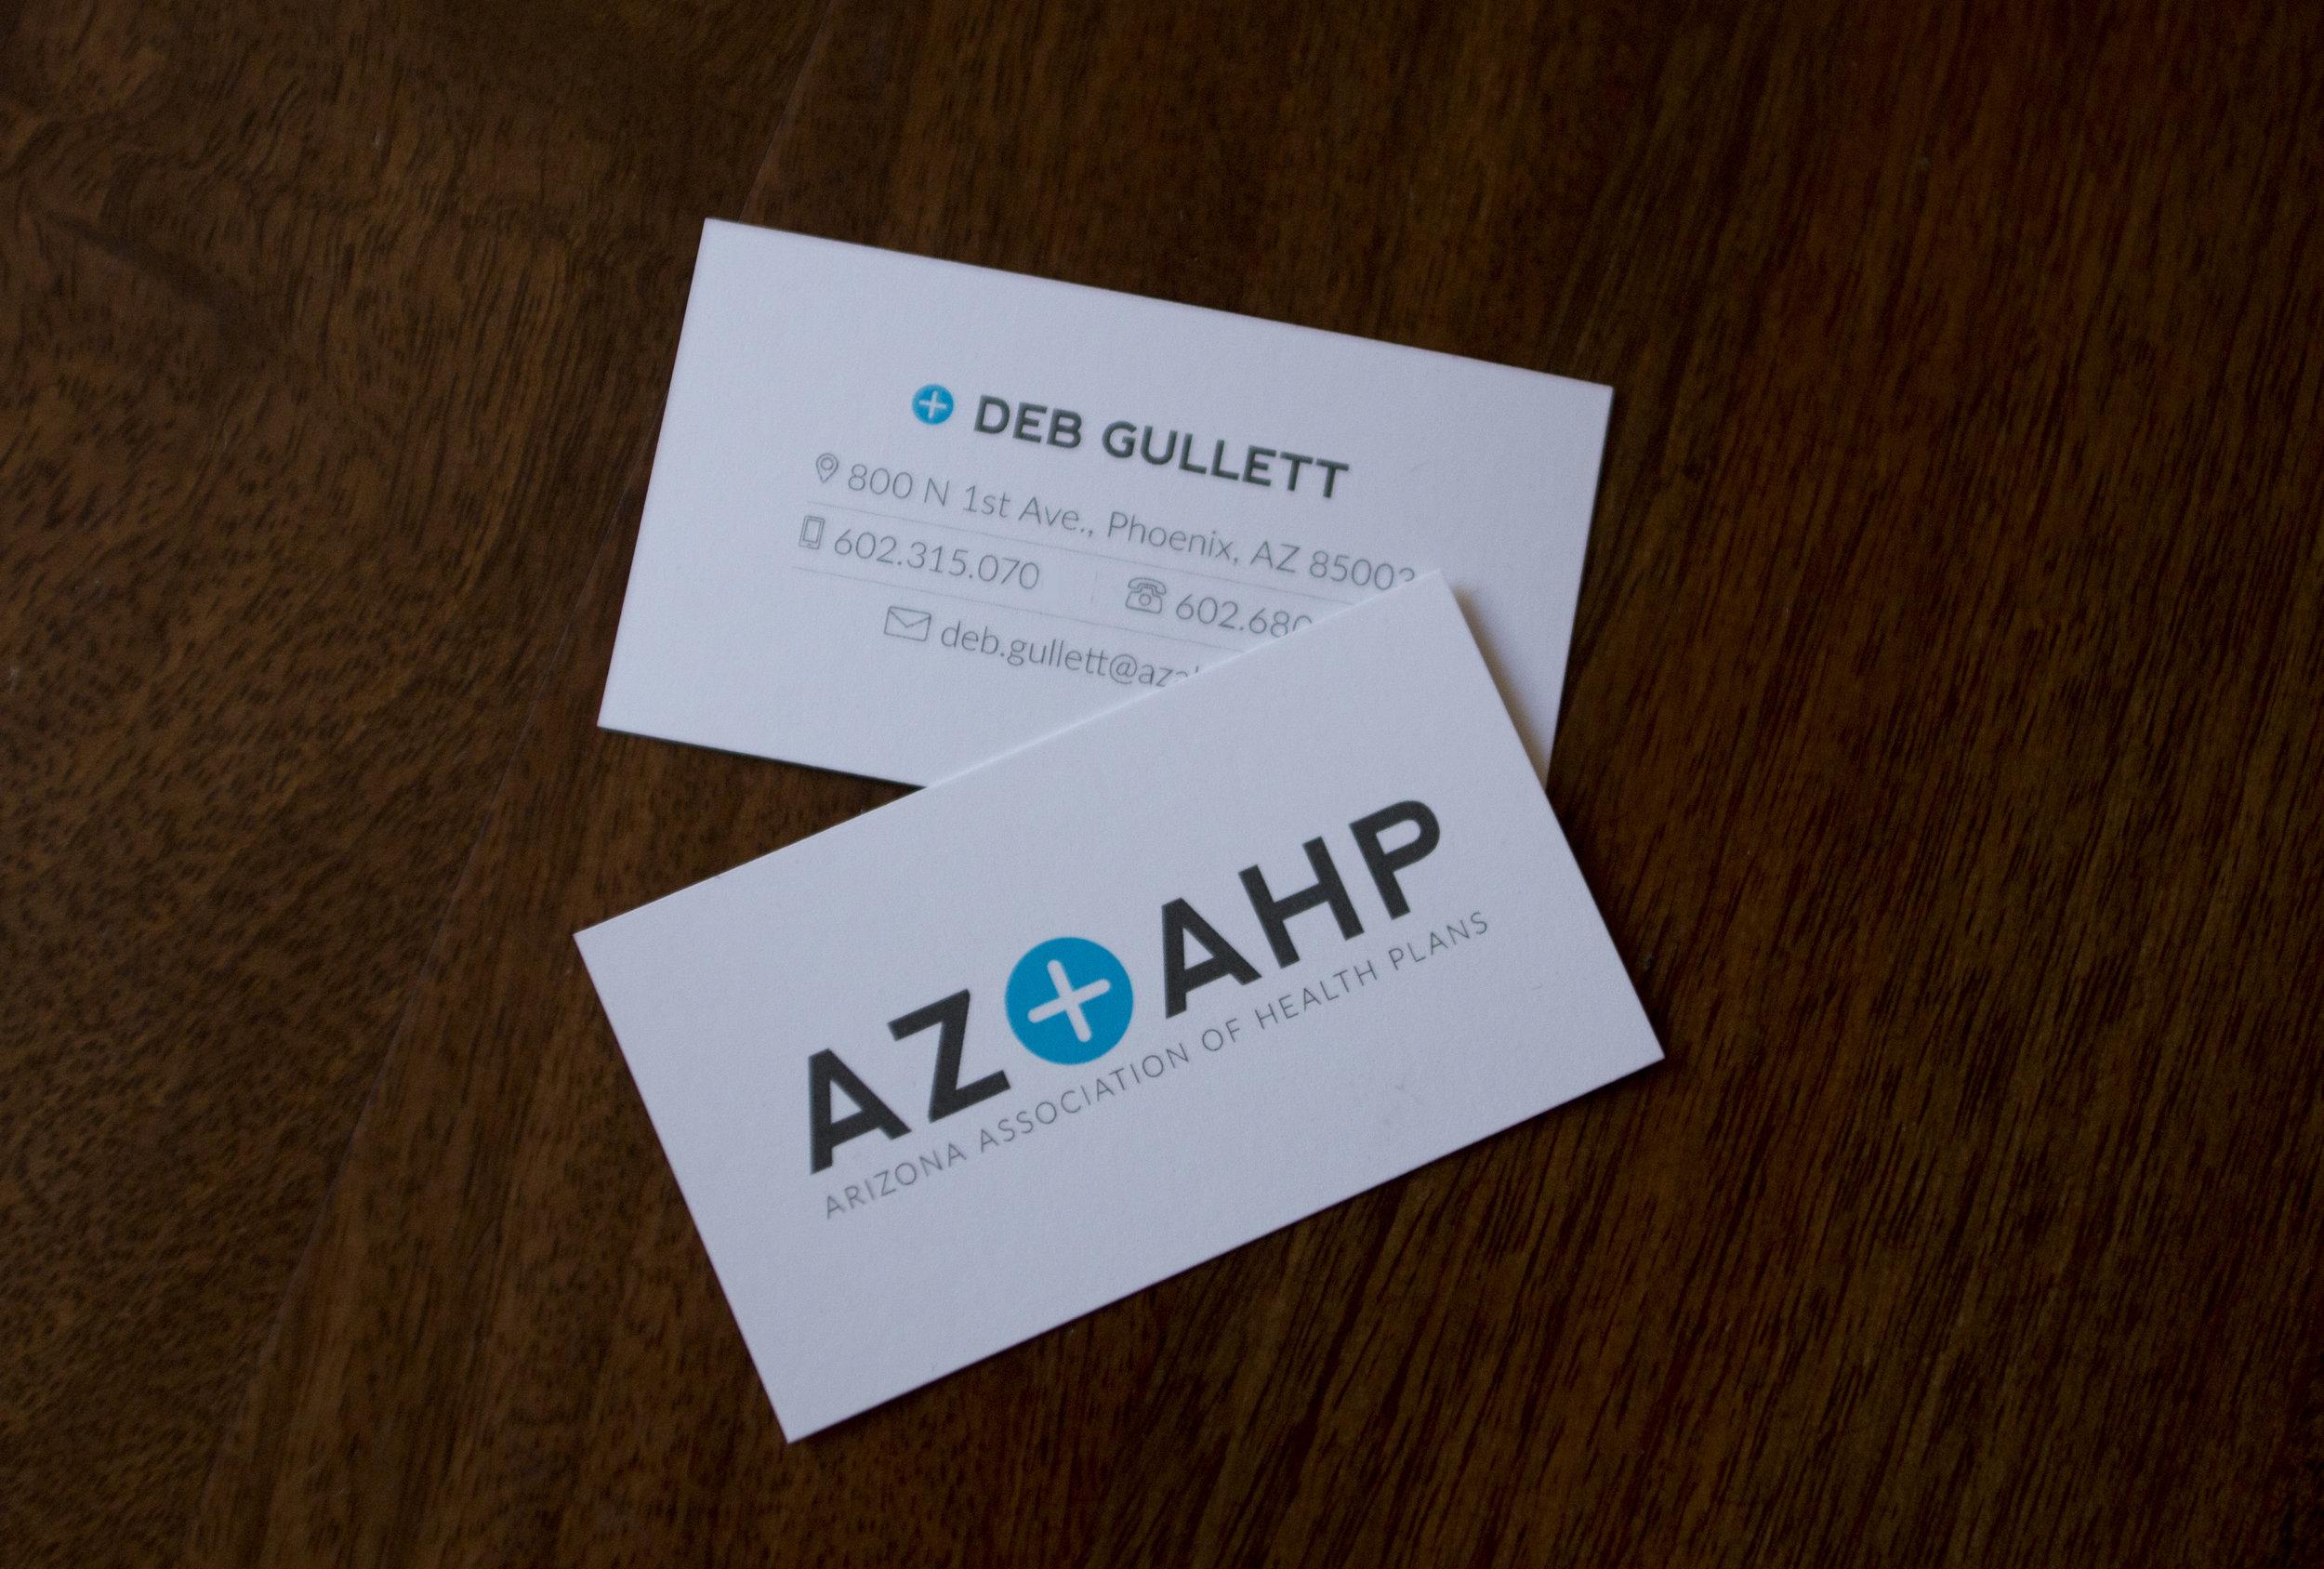 AZAHP business cards